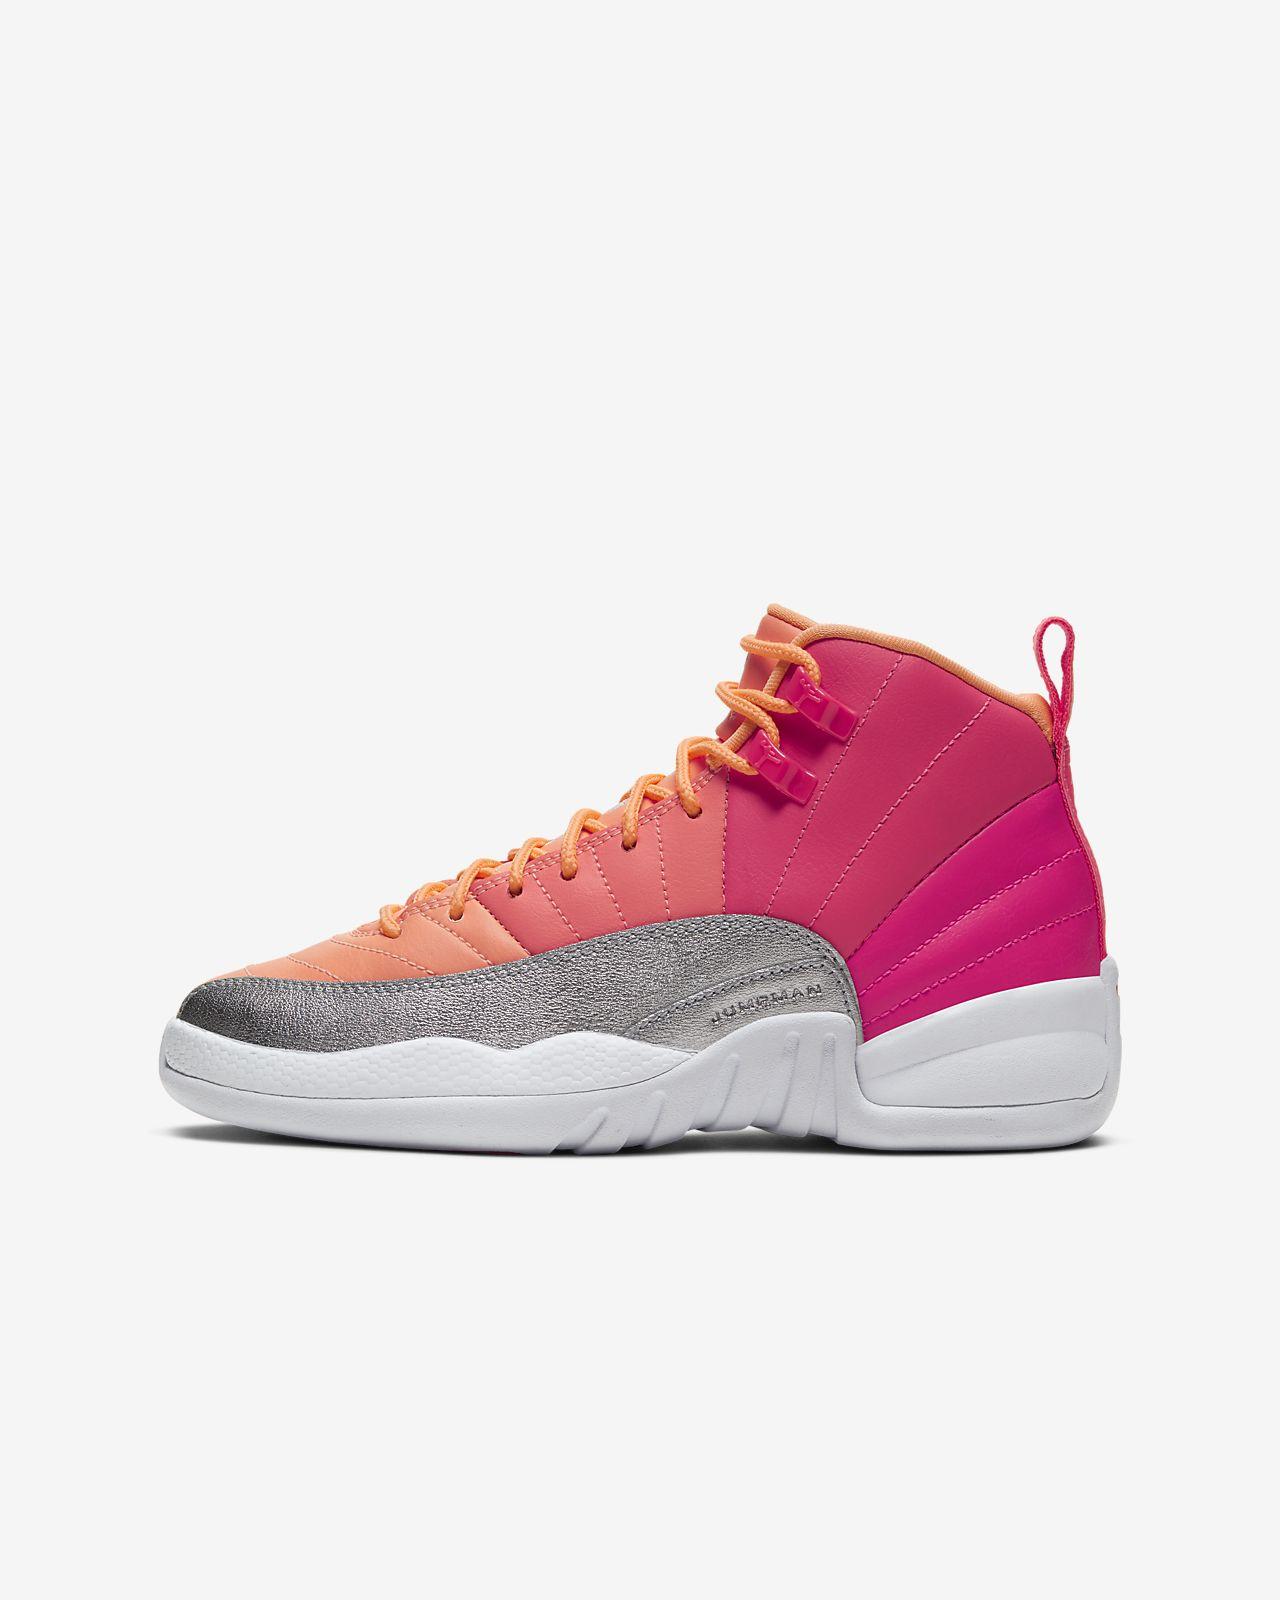 Buty dla dużych dzieci Air Jordan 12 Retro